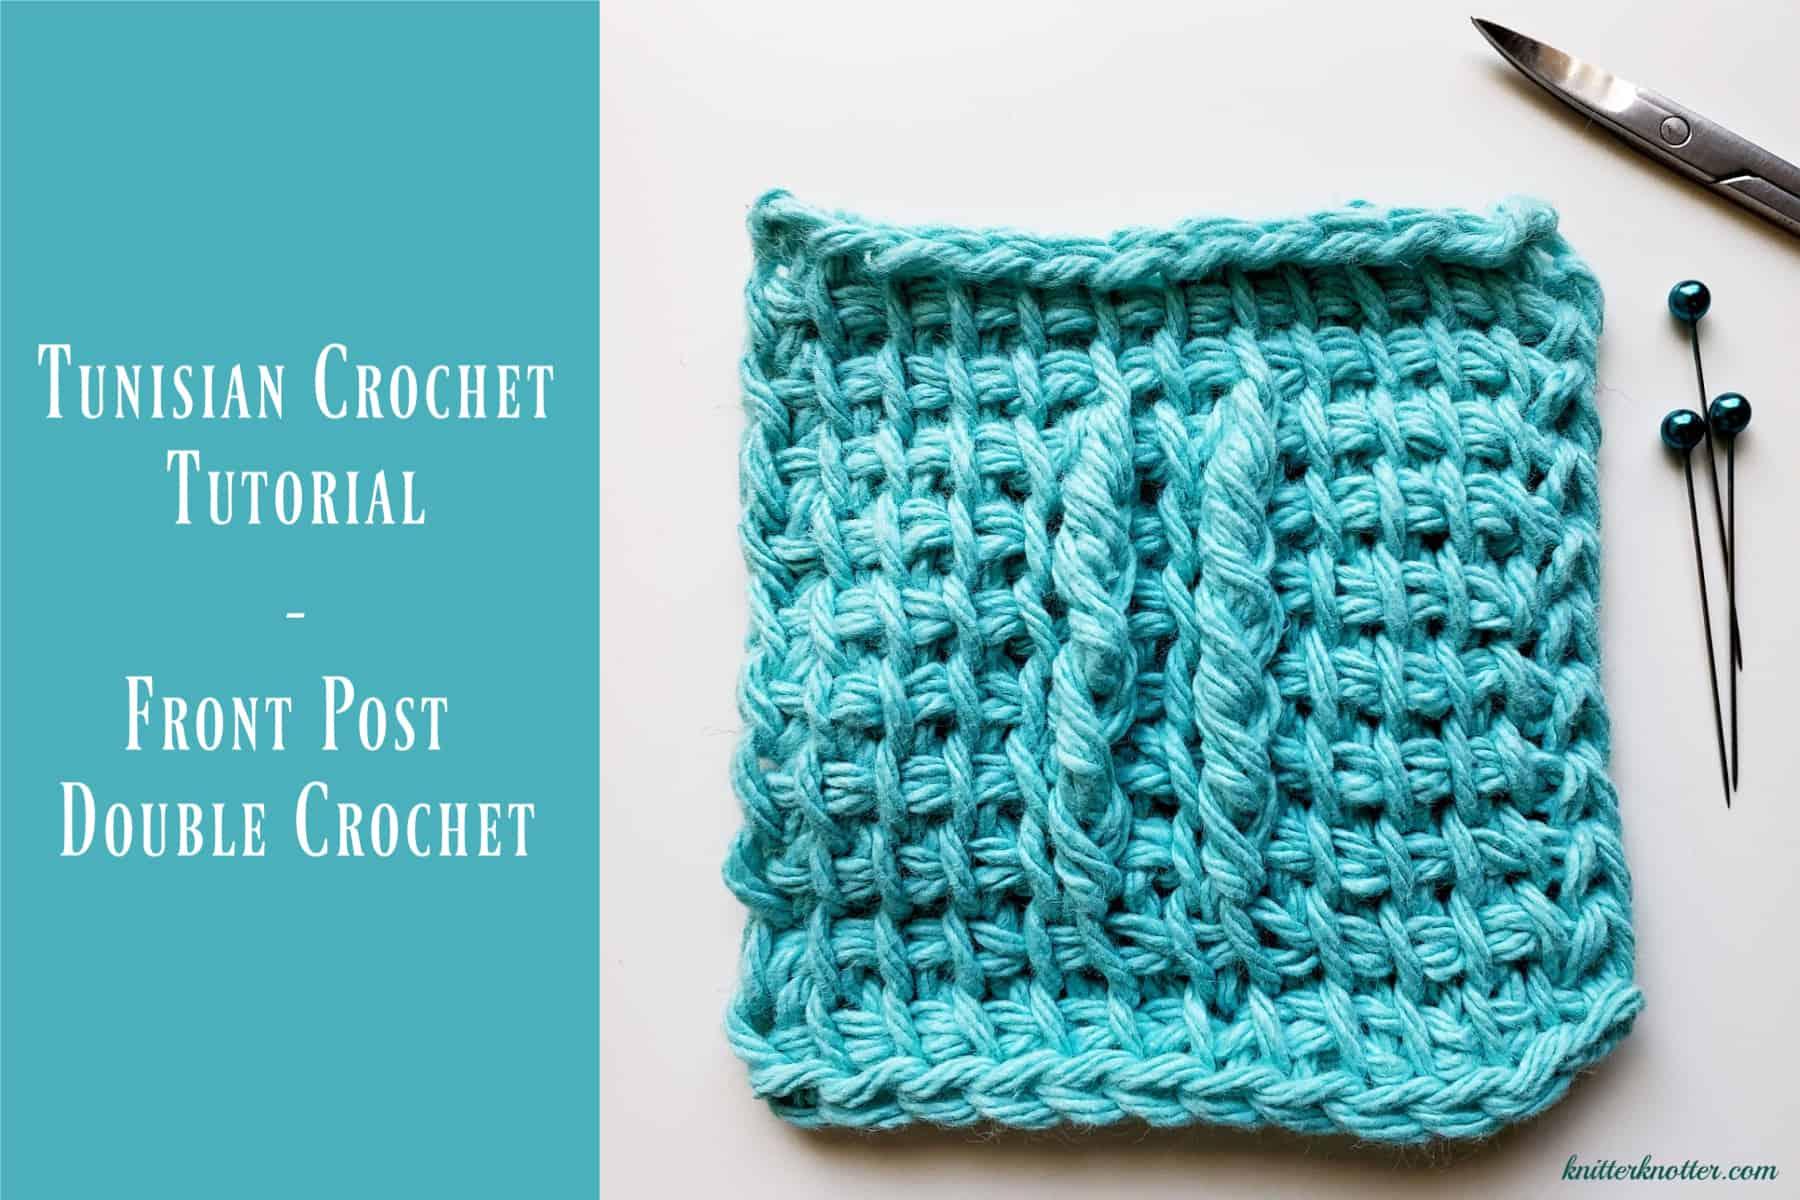 Front post double crochet - Tunisian crochet tutorial